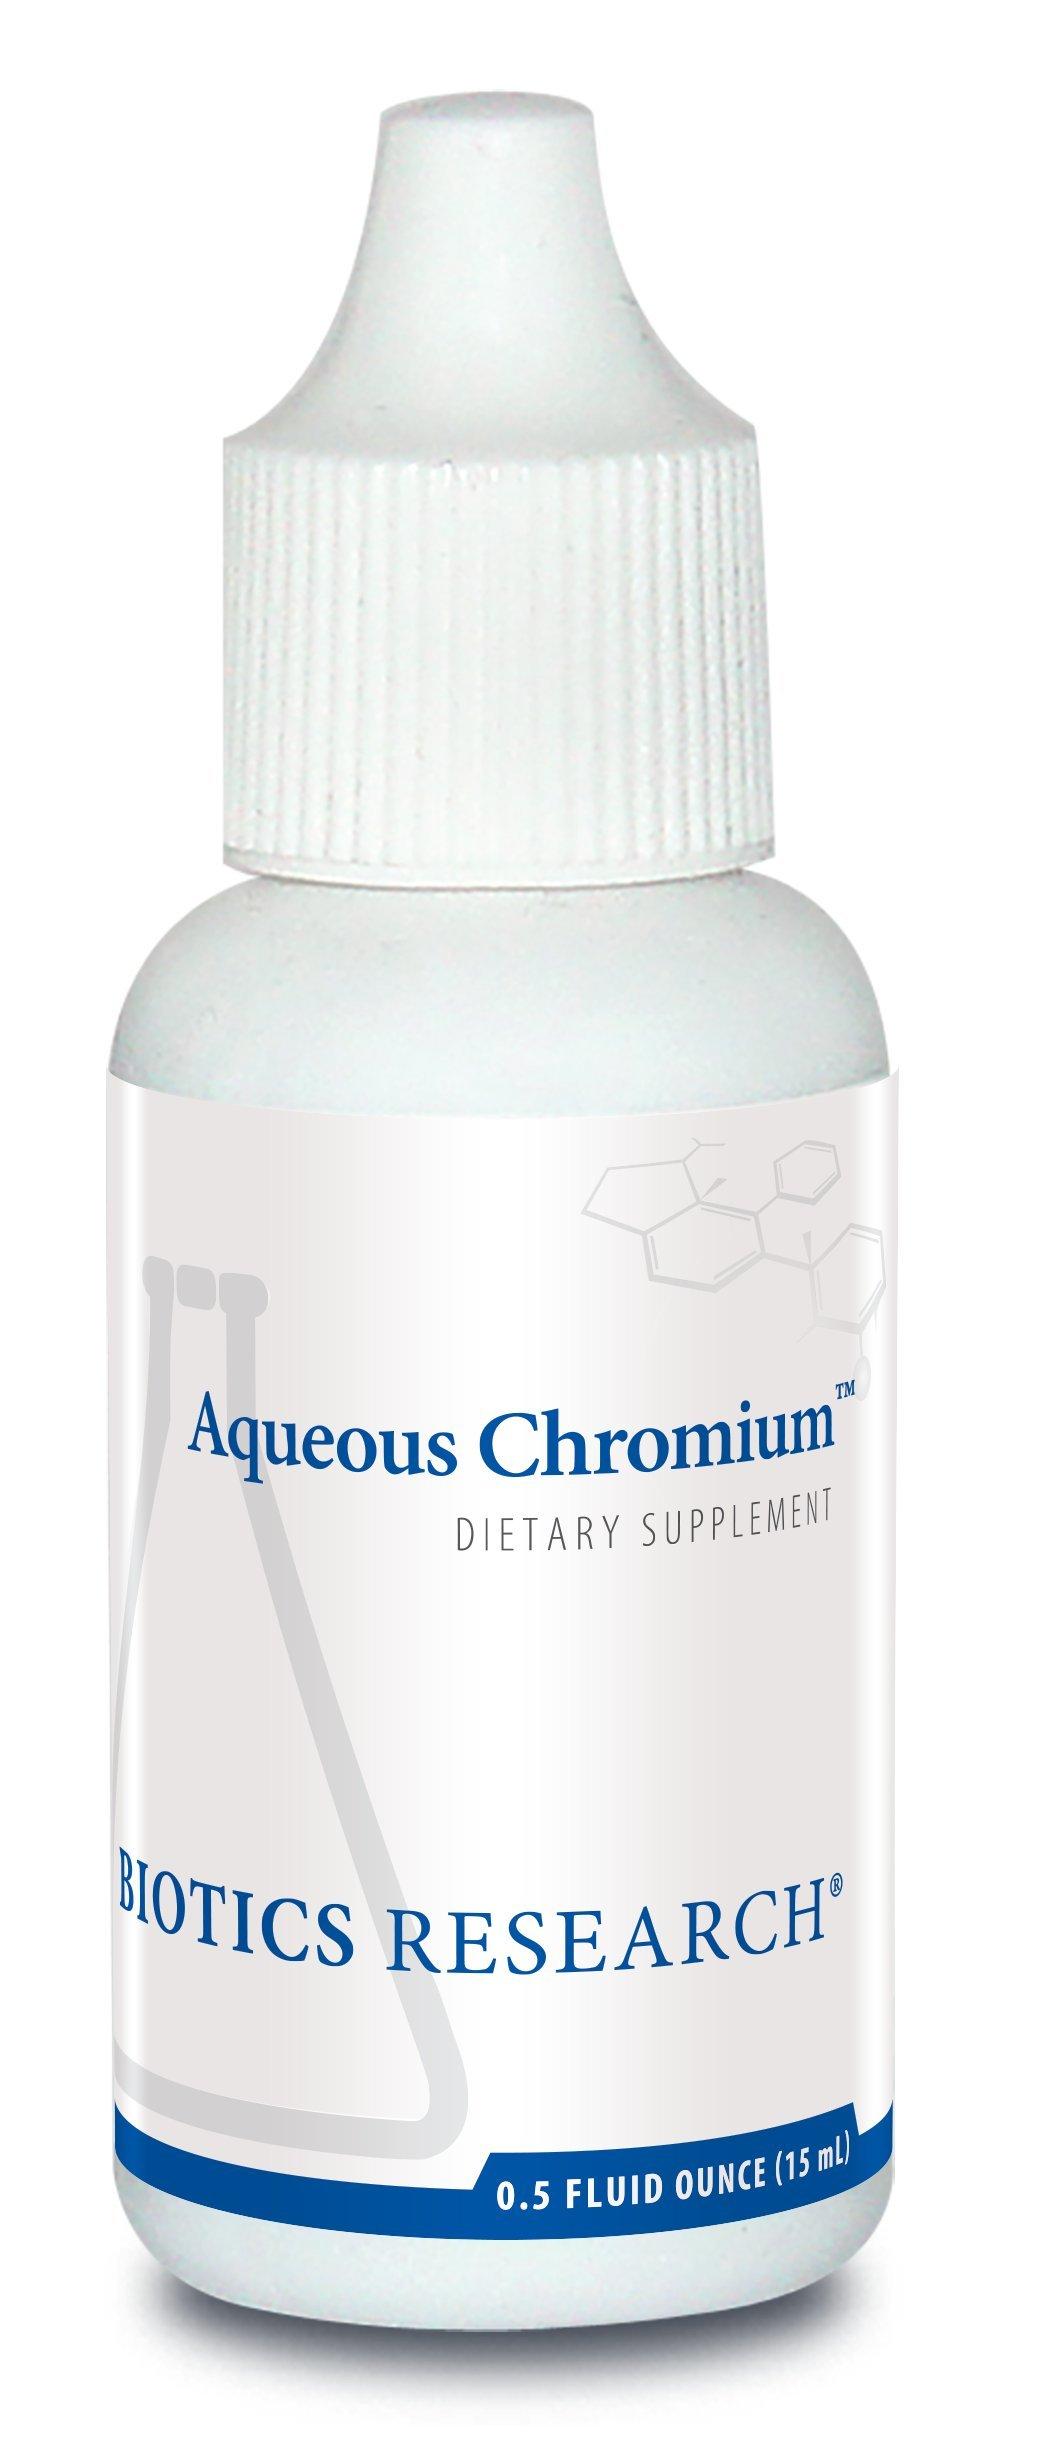 Biotics Research Aqueous Chromium– Easy-to-Take Liquid Formula, 150 Mcg Chromium, Healthy Blood Sugar Maintenance, Glucose Metabolism, Supports Health Lipid and Triglyceride Levels 0.5 Fl oz